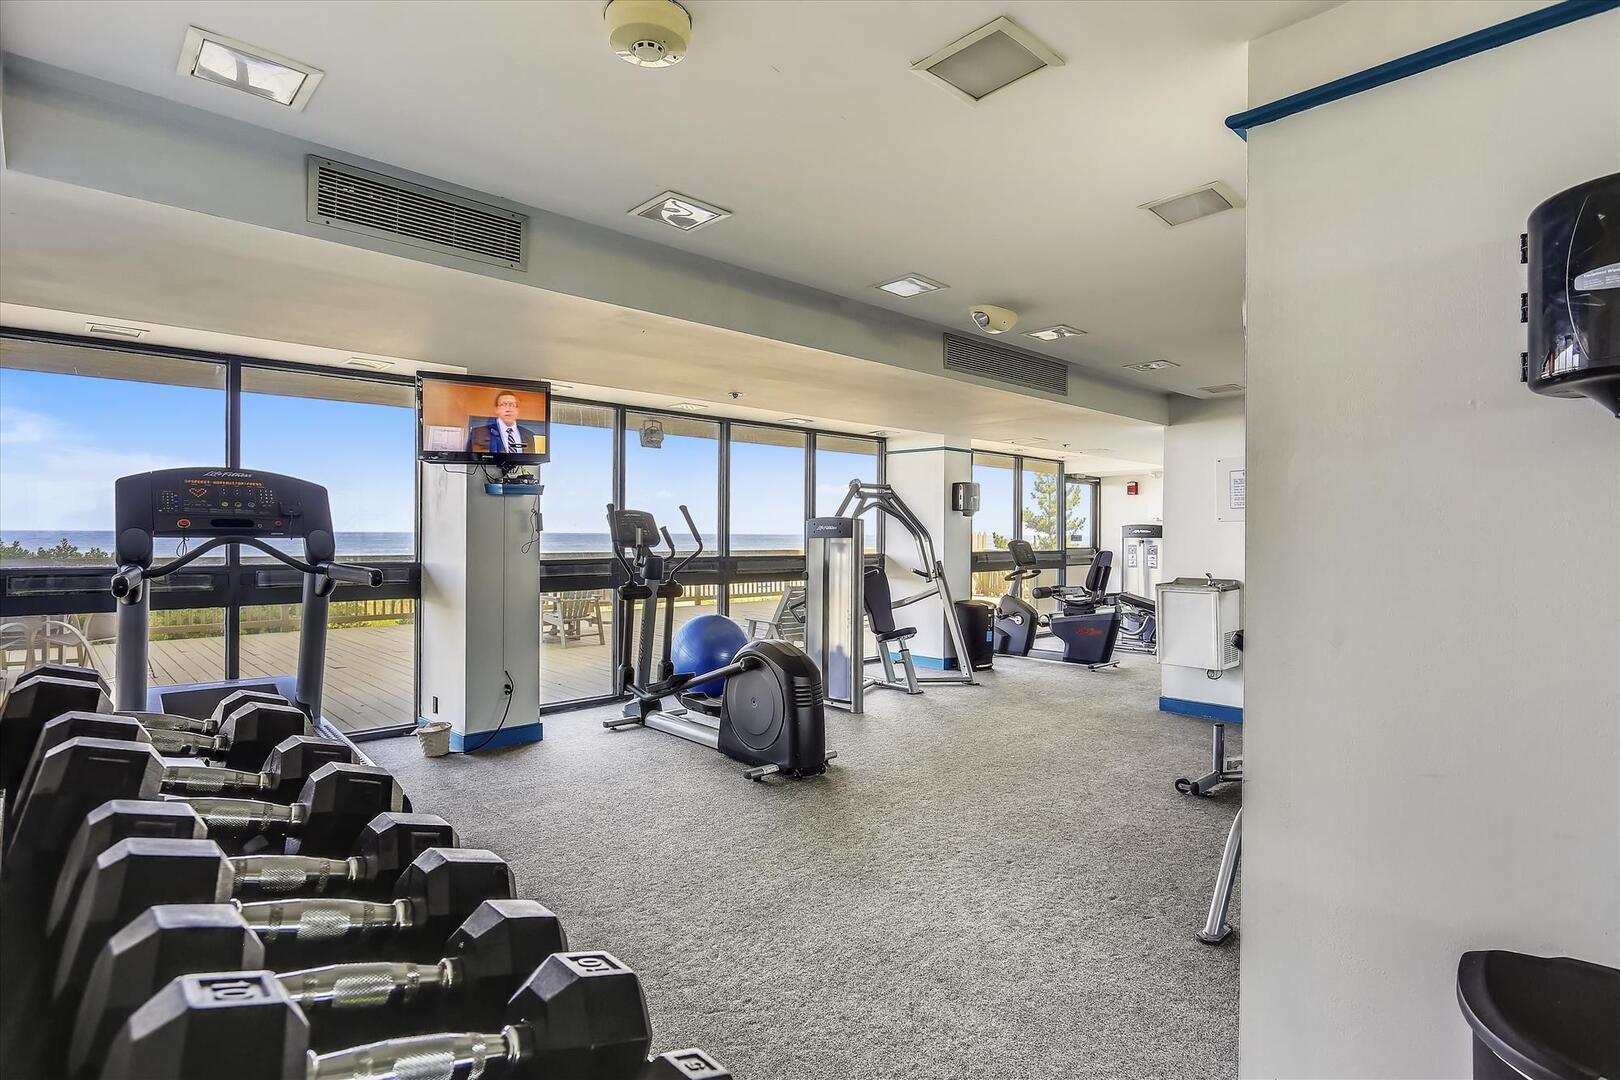 Fitness Center of Century I Building